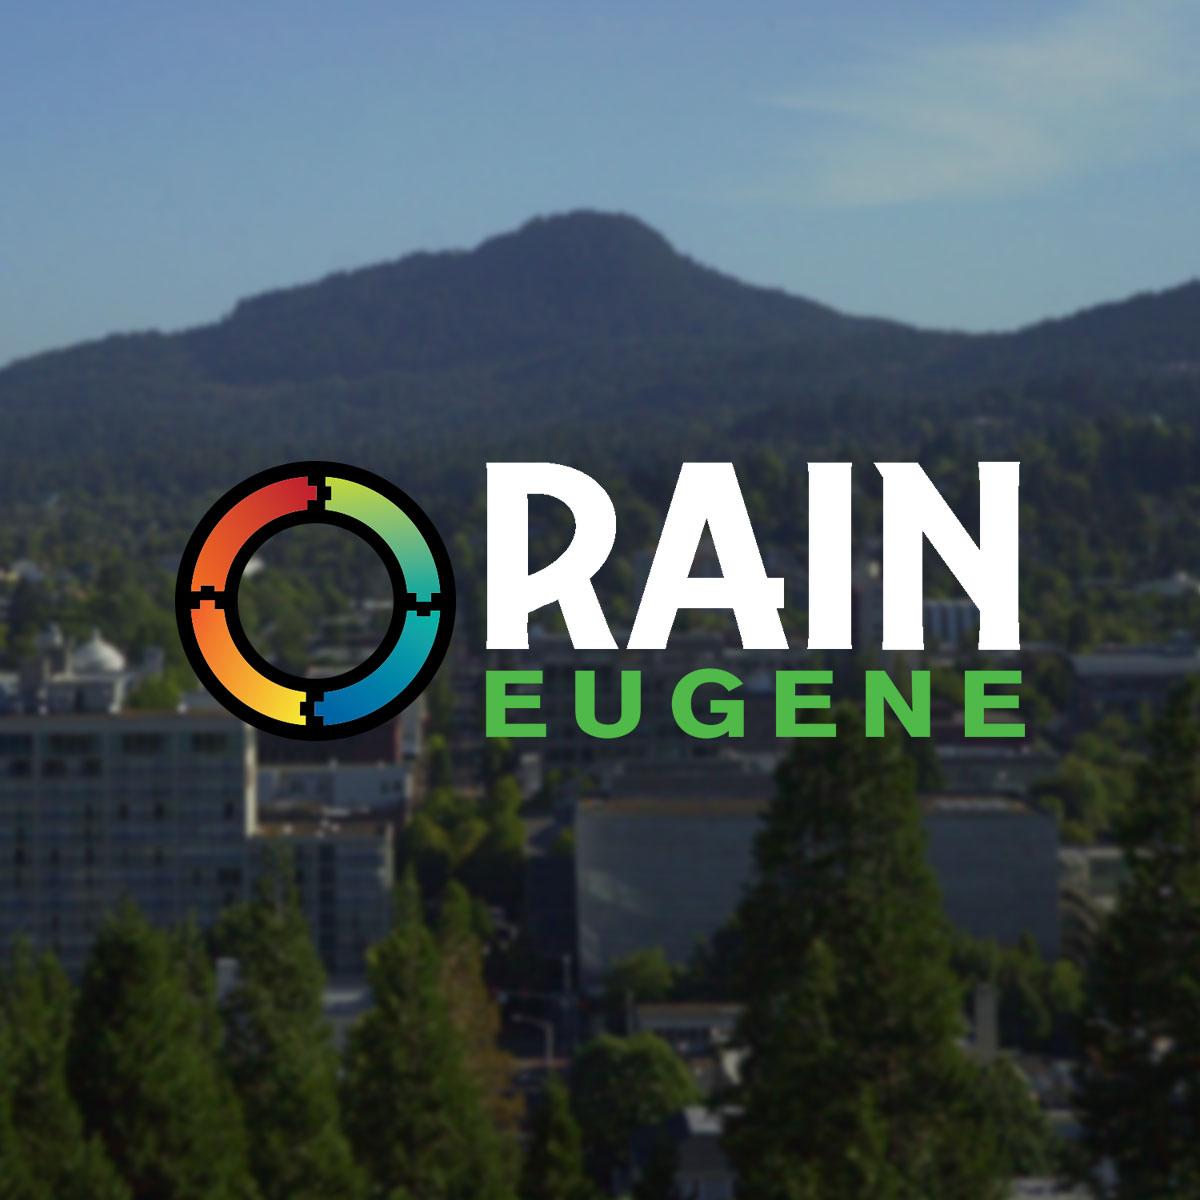 Springfield Oregon: Regional Accelerator & Innovation Network